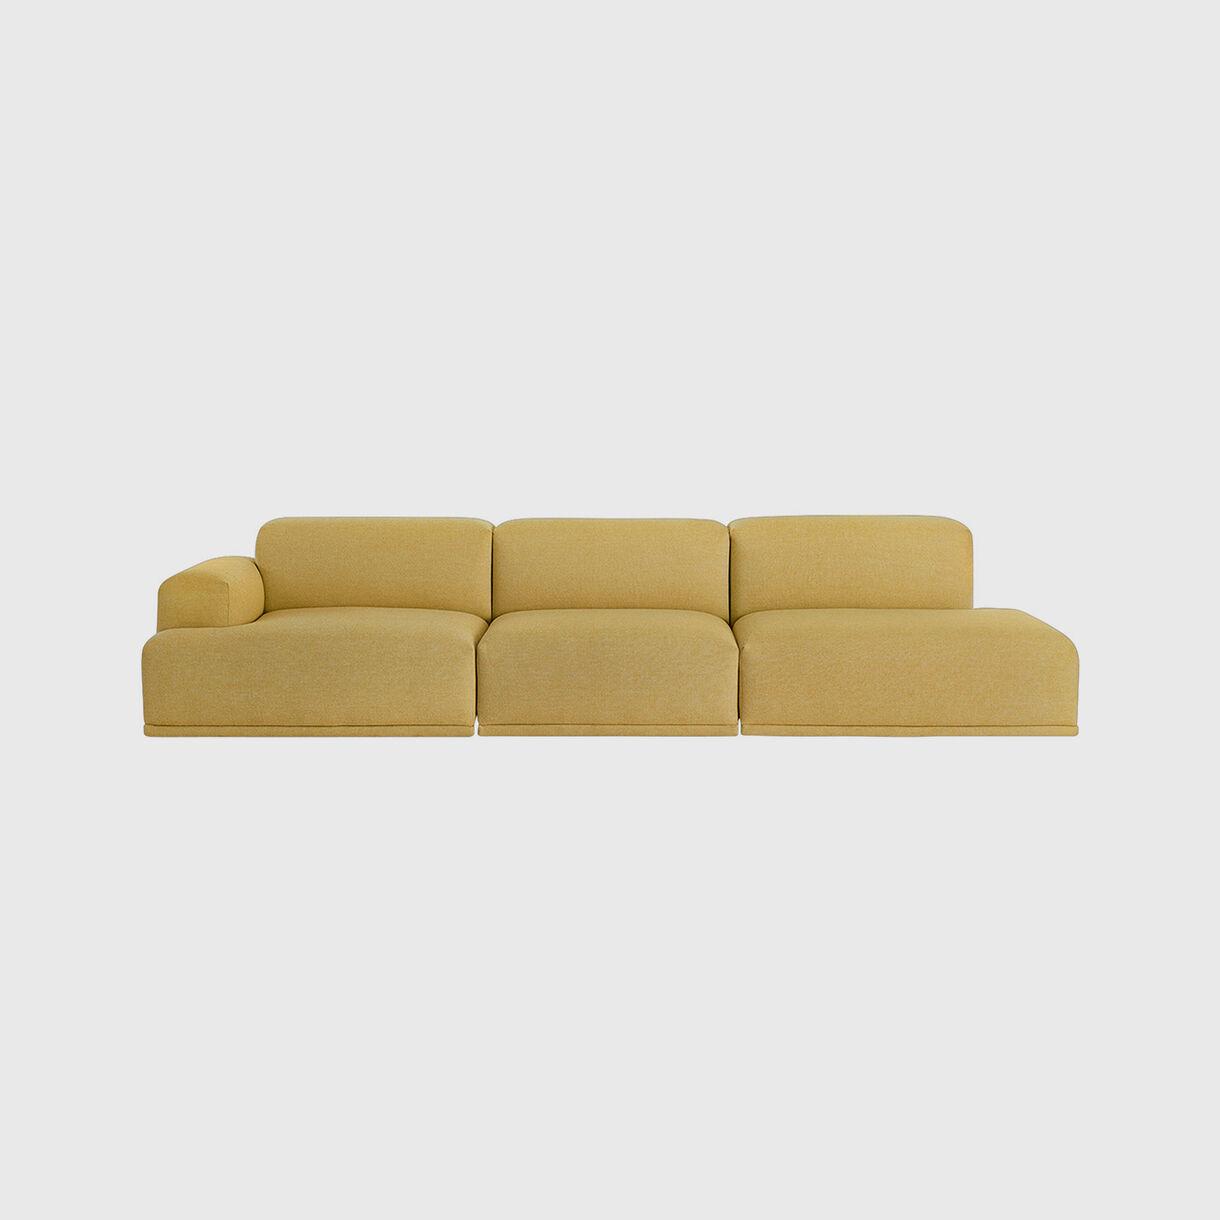 Connect Modular Sofa, 3 Seater, Hallingdal 407